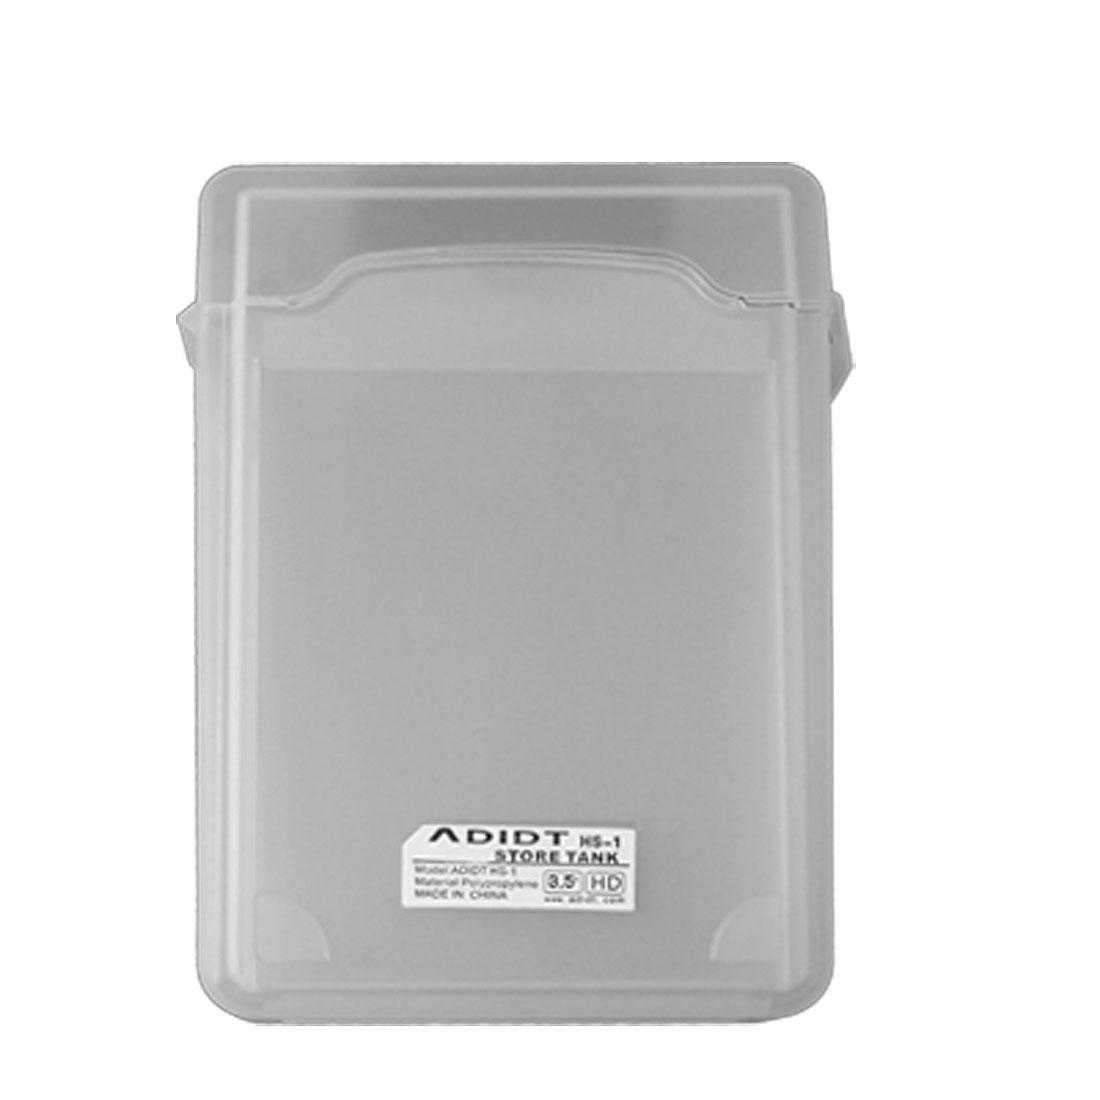 White Plastic 3.5 Inch SATA IDE Hard Disk Drive Case HDD Store Tank Box